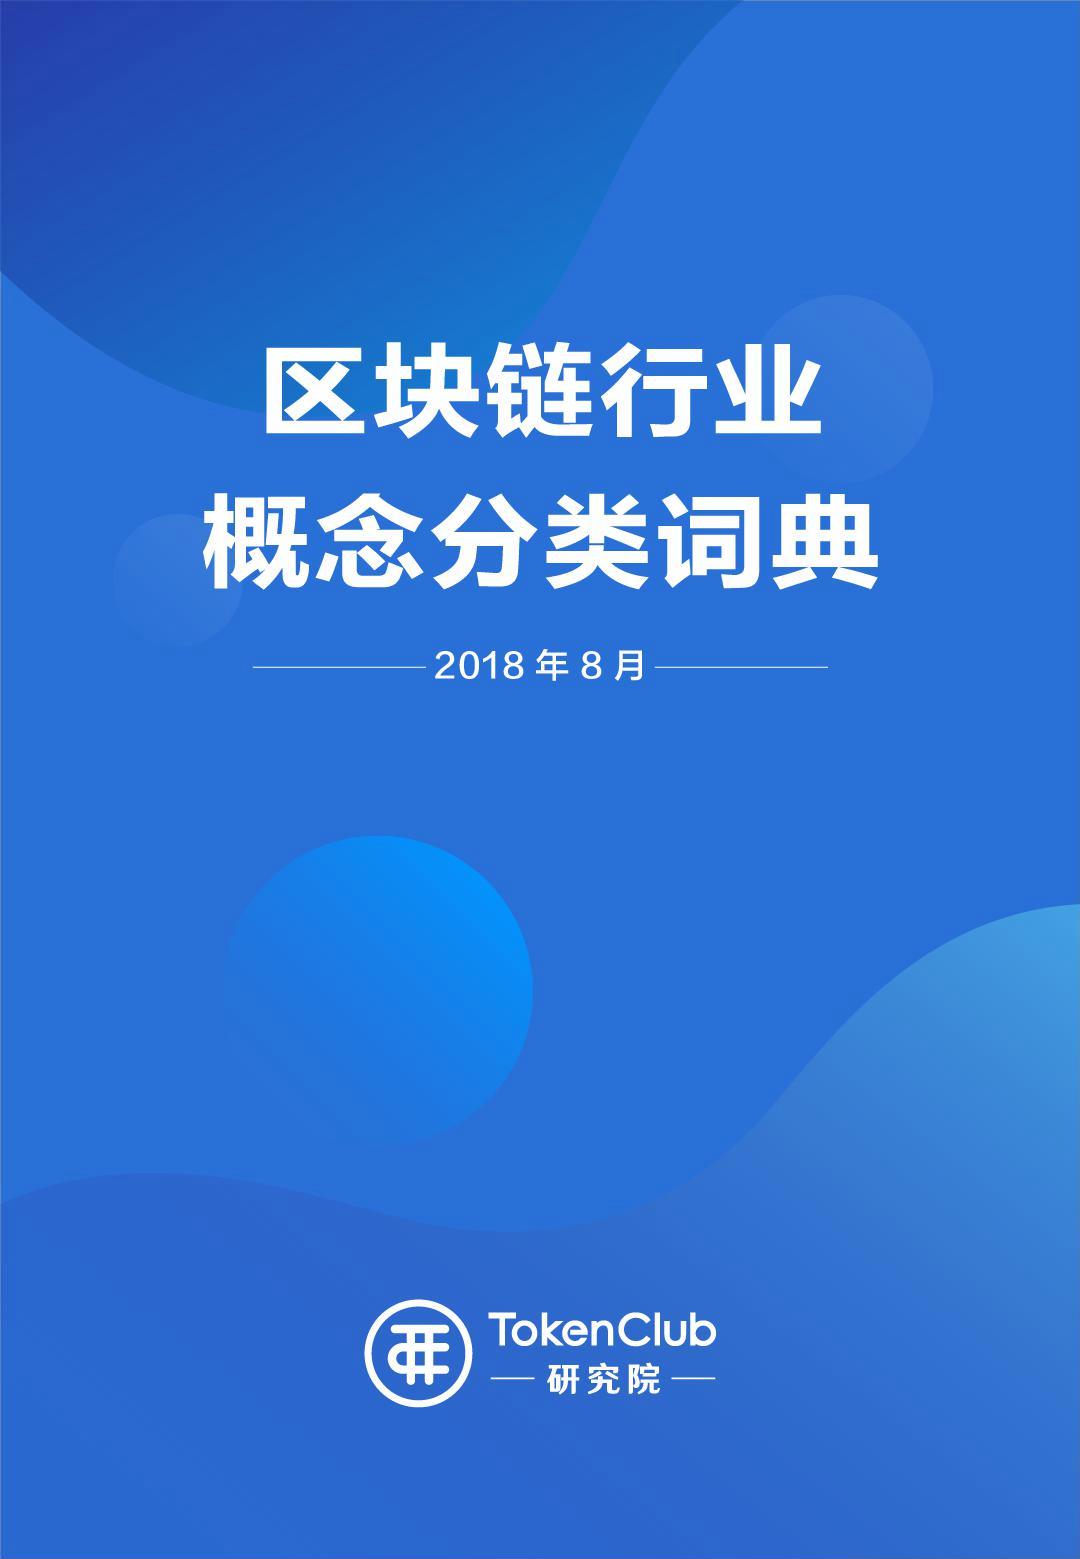 TokenClub-区块链行业概念分类词典-2018.8-39页